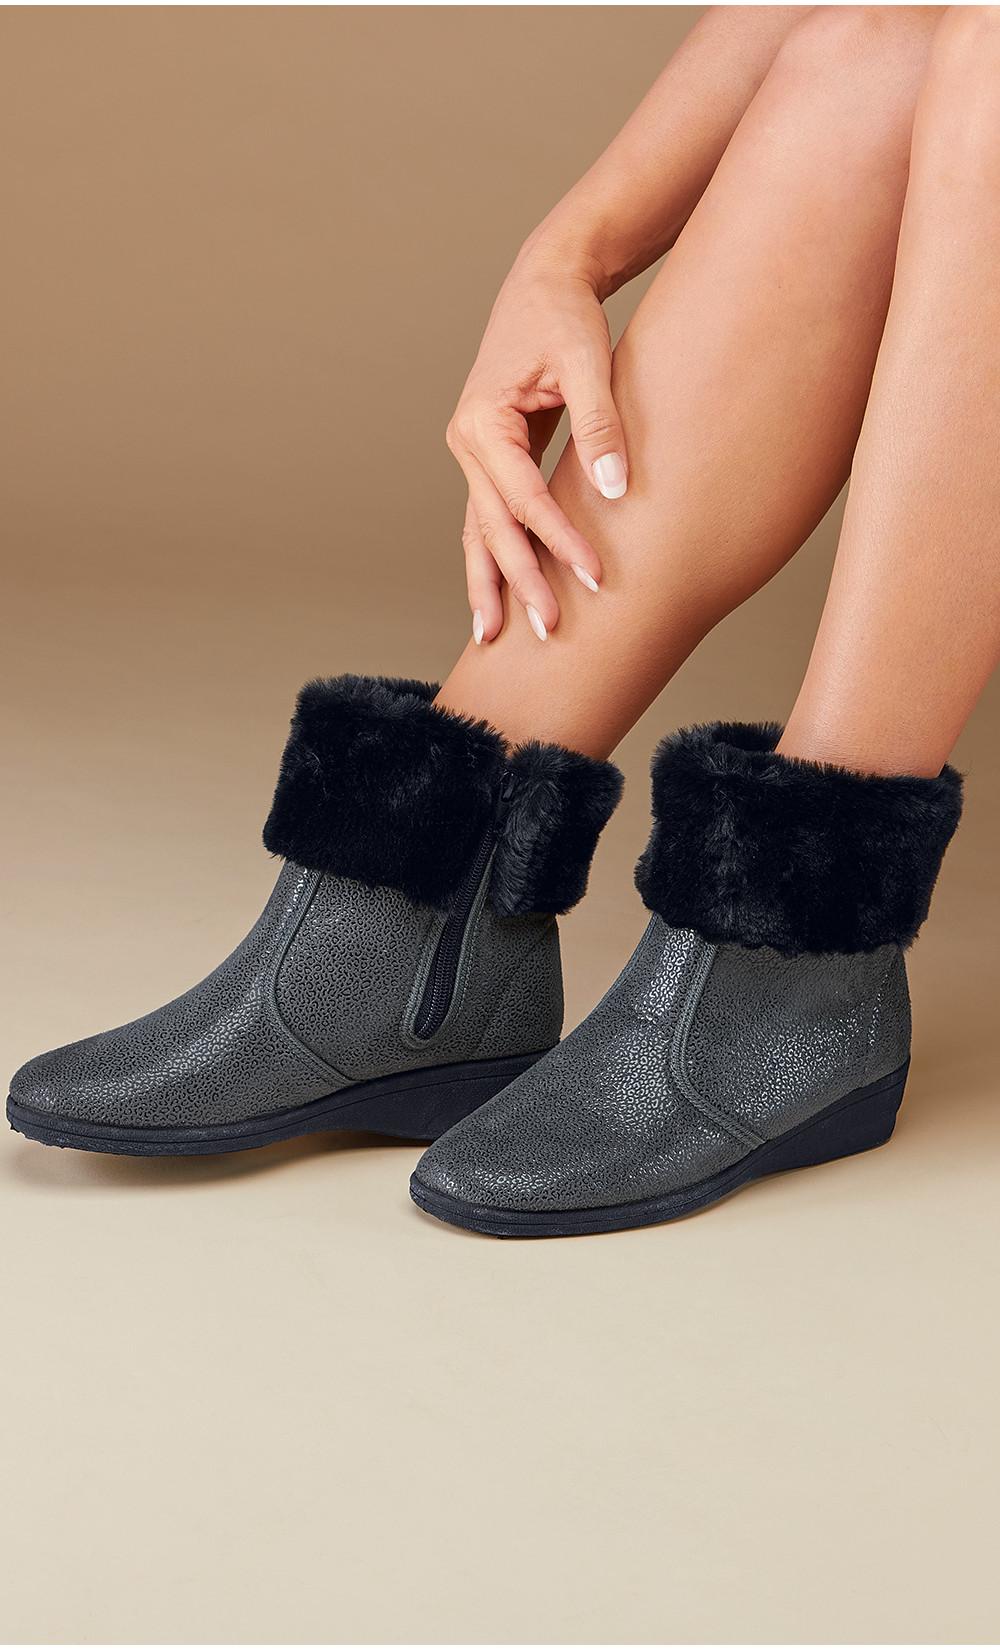 boots - ORIBASE